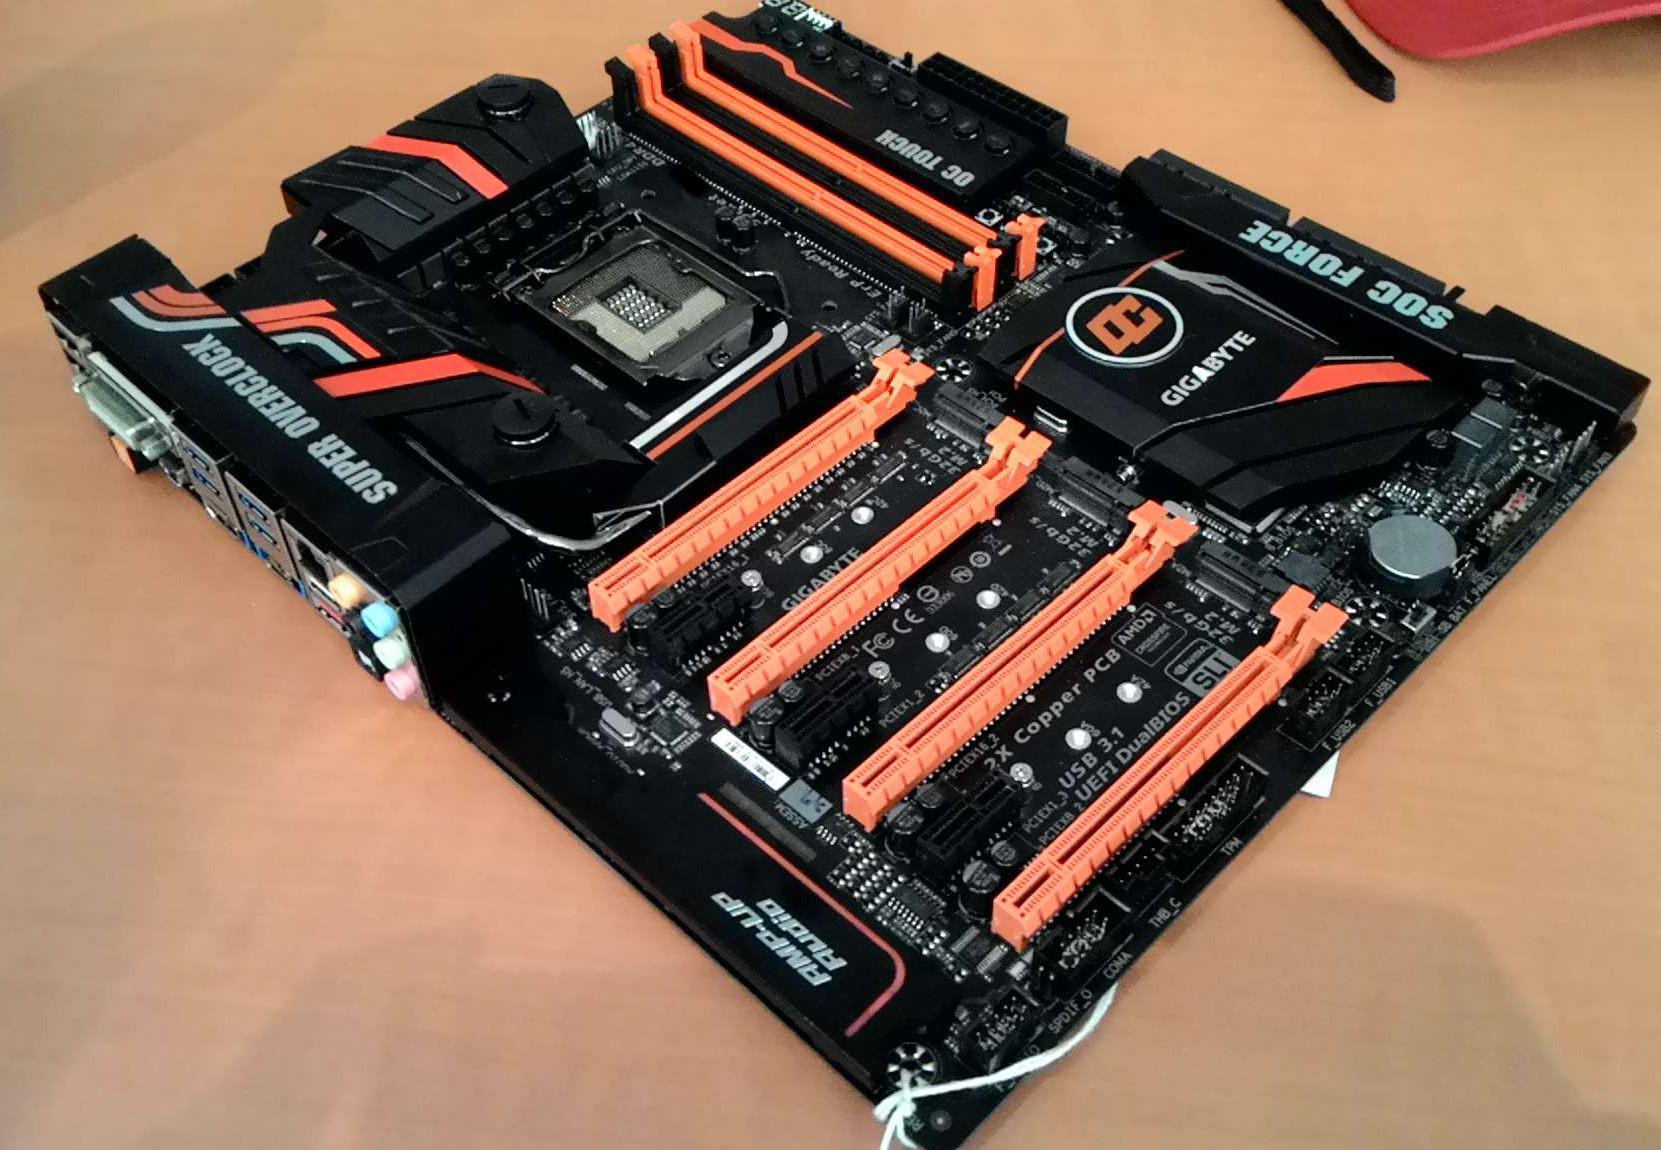 Latest Overclocking Programs System Info Benchmarking Stability Mainboard Motherboard Gigabyte Ga Z270 Phoenix Gaming Socket 1151 Kaby Lake Intel Tools